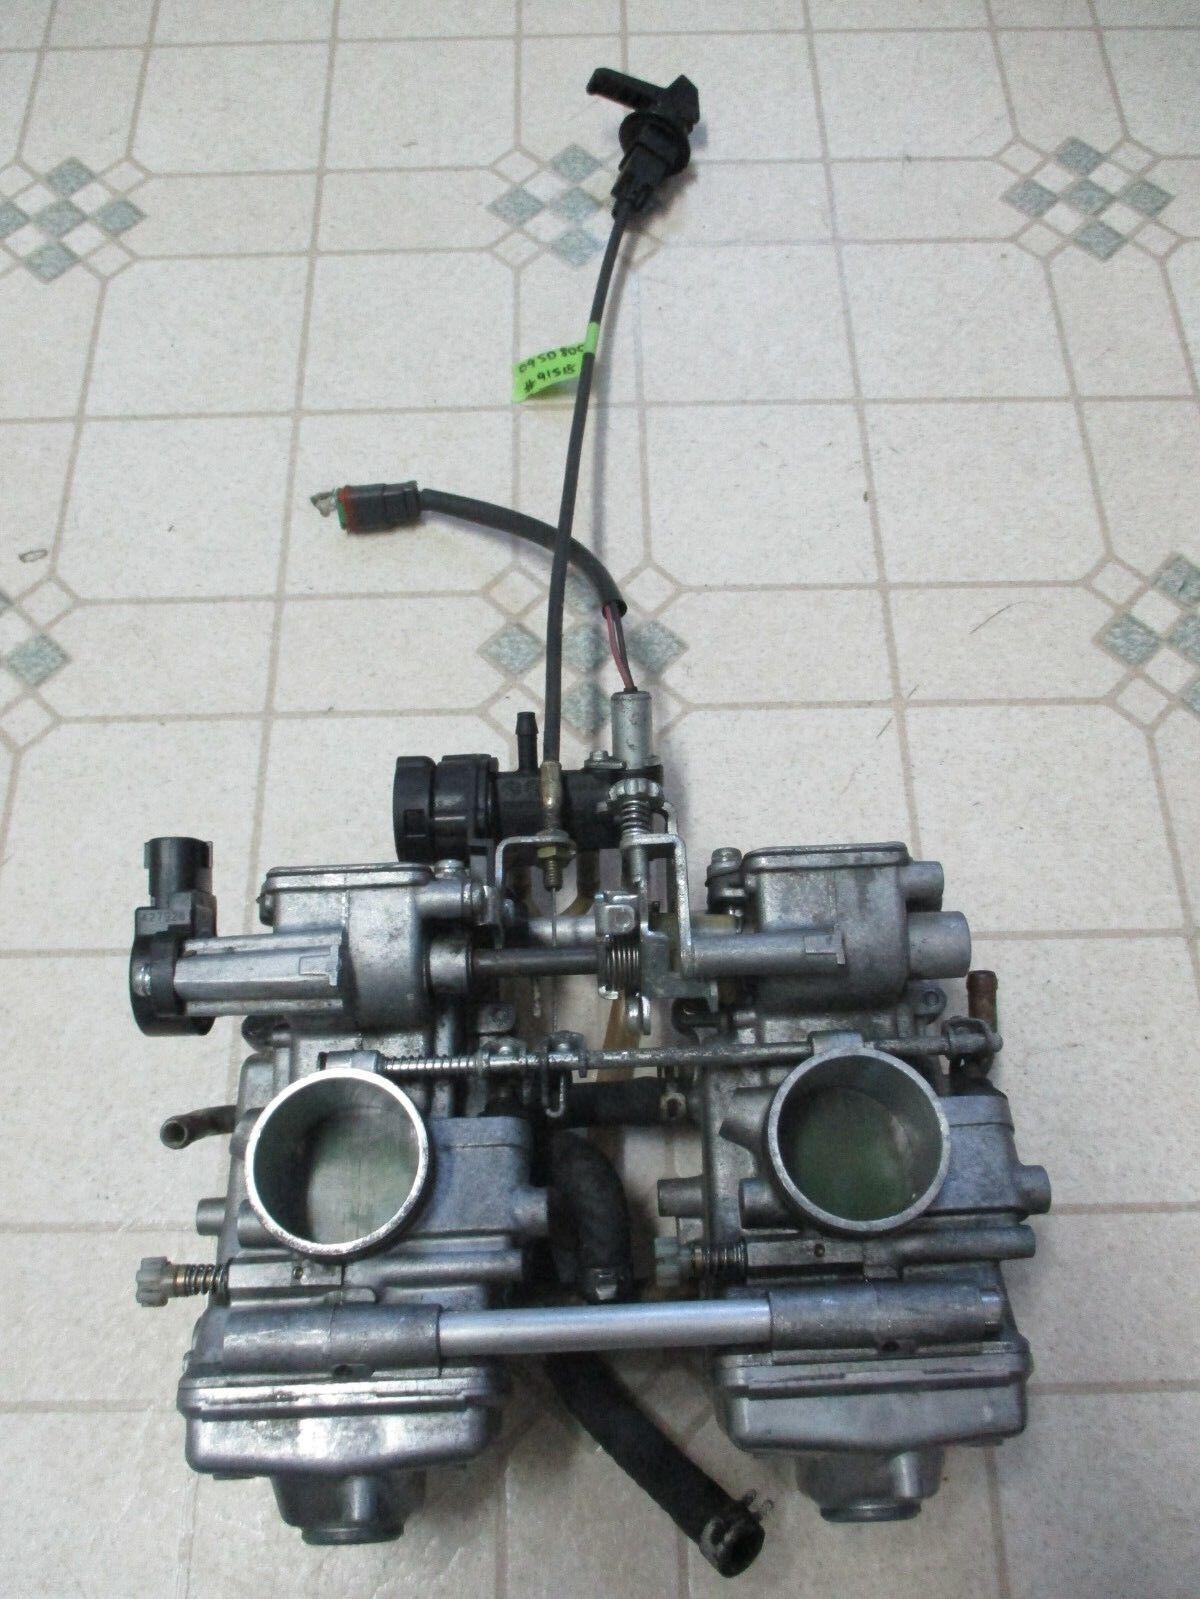 09 Ski Doo 800R Snowmobile Mikuni Carburetors Carbs Summit REV MXZ 08 Power Tek